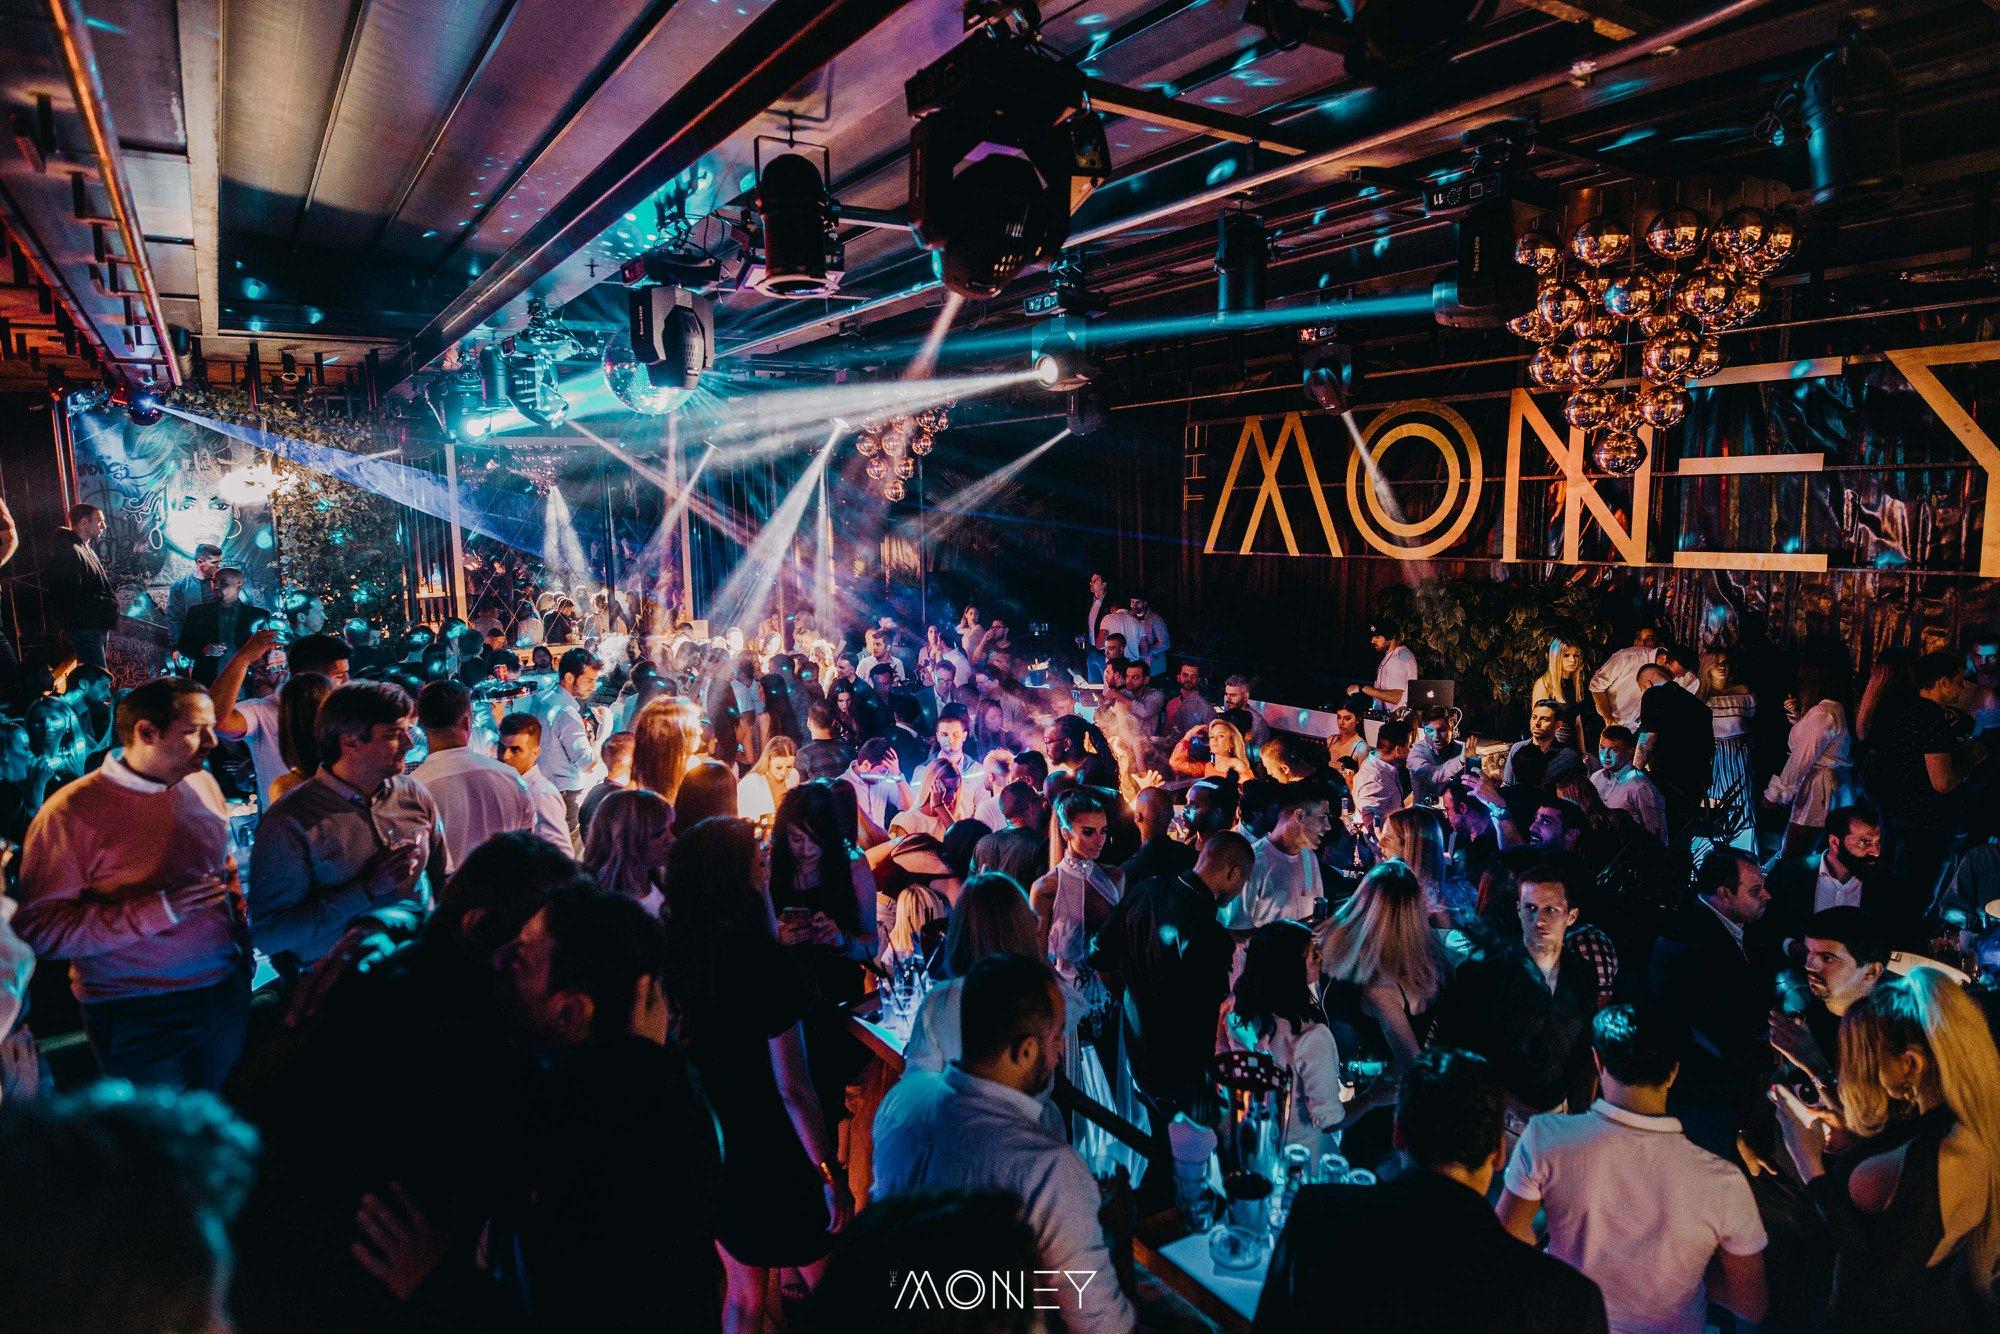 Vruće letnje žurke na Splavu The Money uz gostovanje najboljih DJ-eva